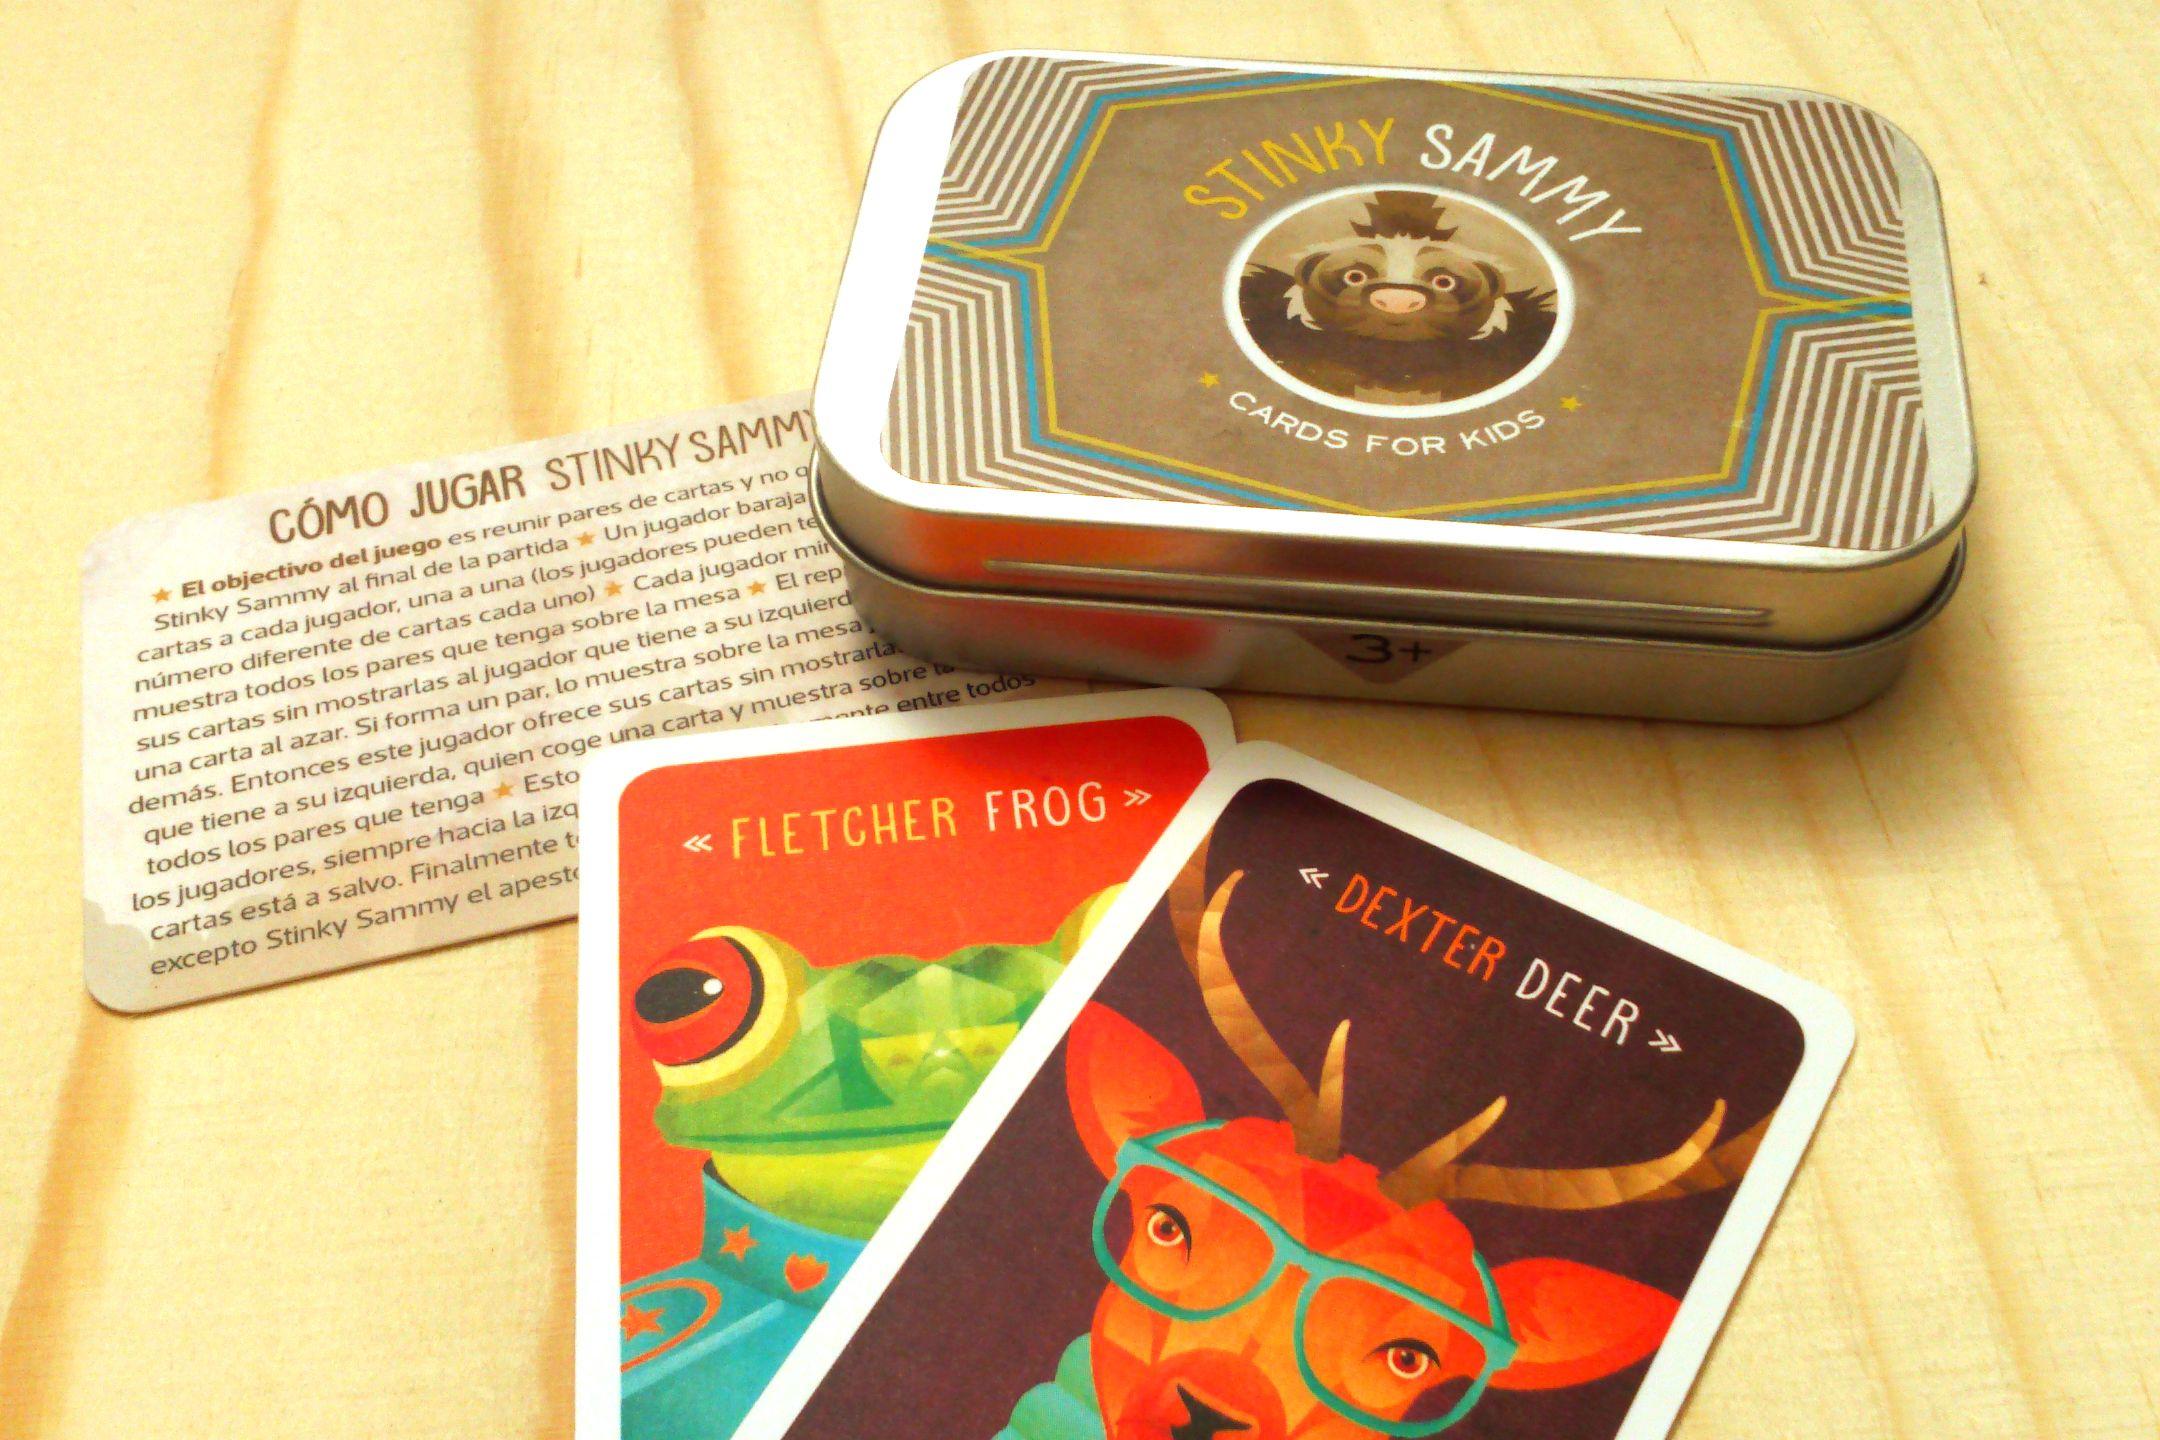 STINKY SAMMY Card game. With unique Illustrations by DistelfinkStudio. |  Cartas, Dexter, Jugar